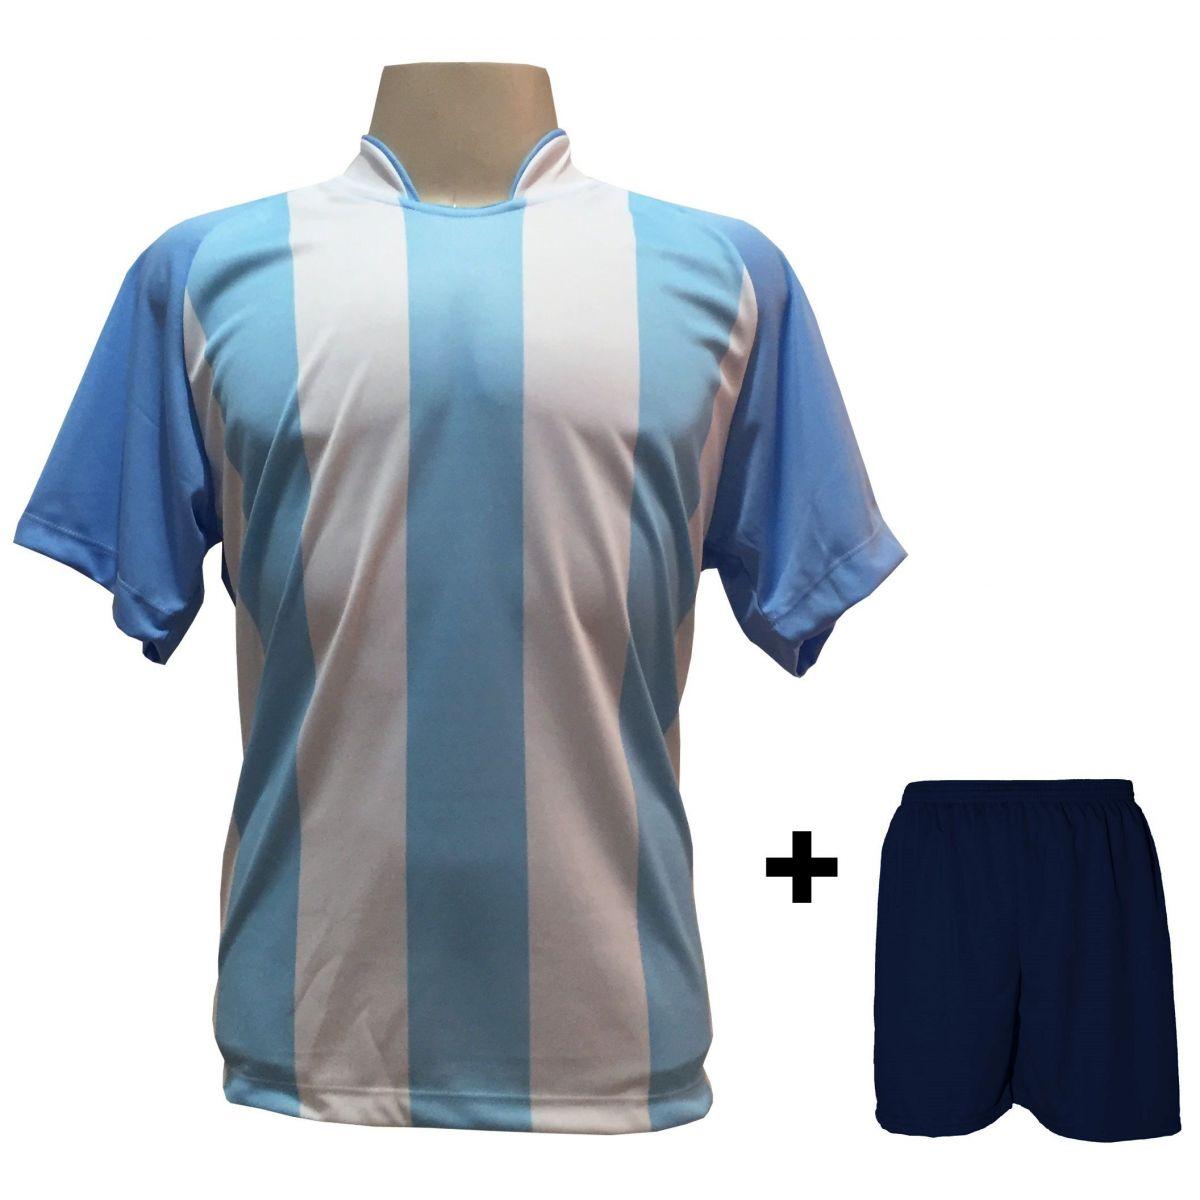 Uniforme Esportivo com 12 camisas modelo modelo Milan Celeste Branco ... 39b24773c6bc3